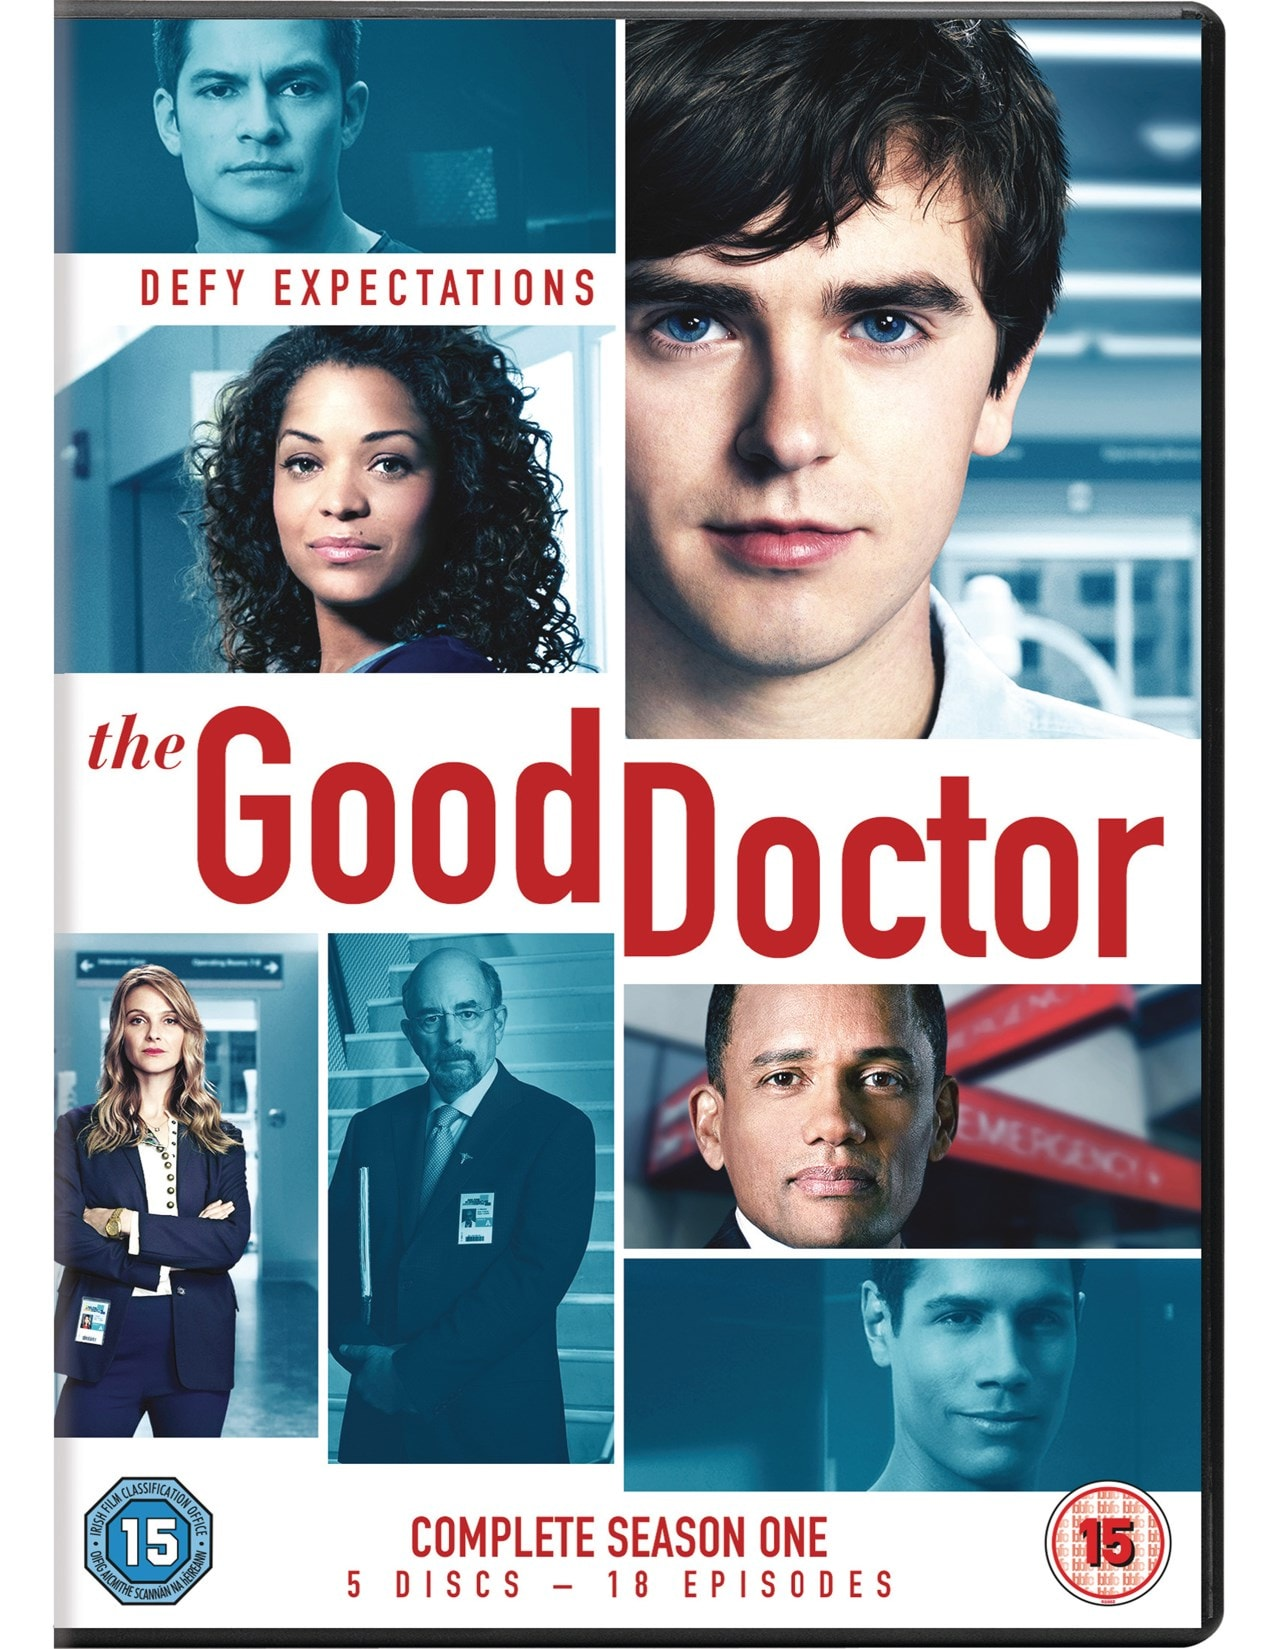 The Good Doctor: Season One - 1